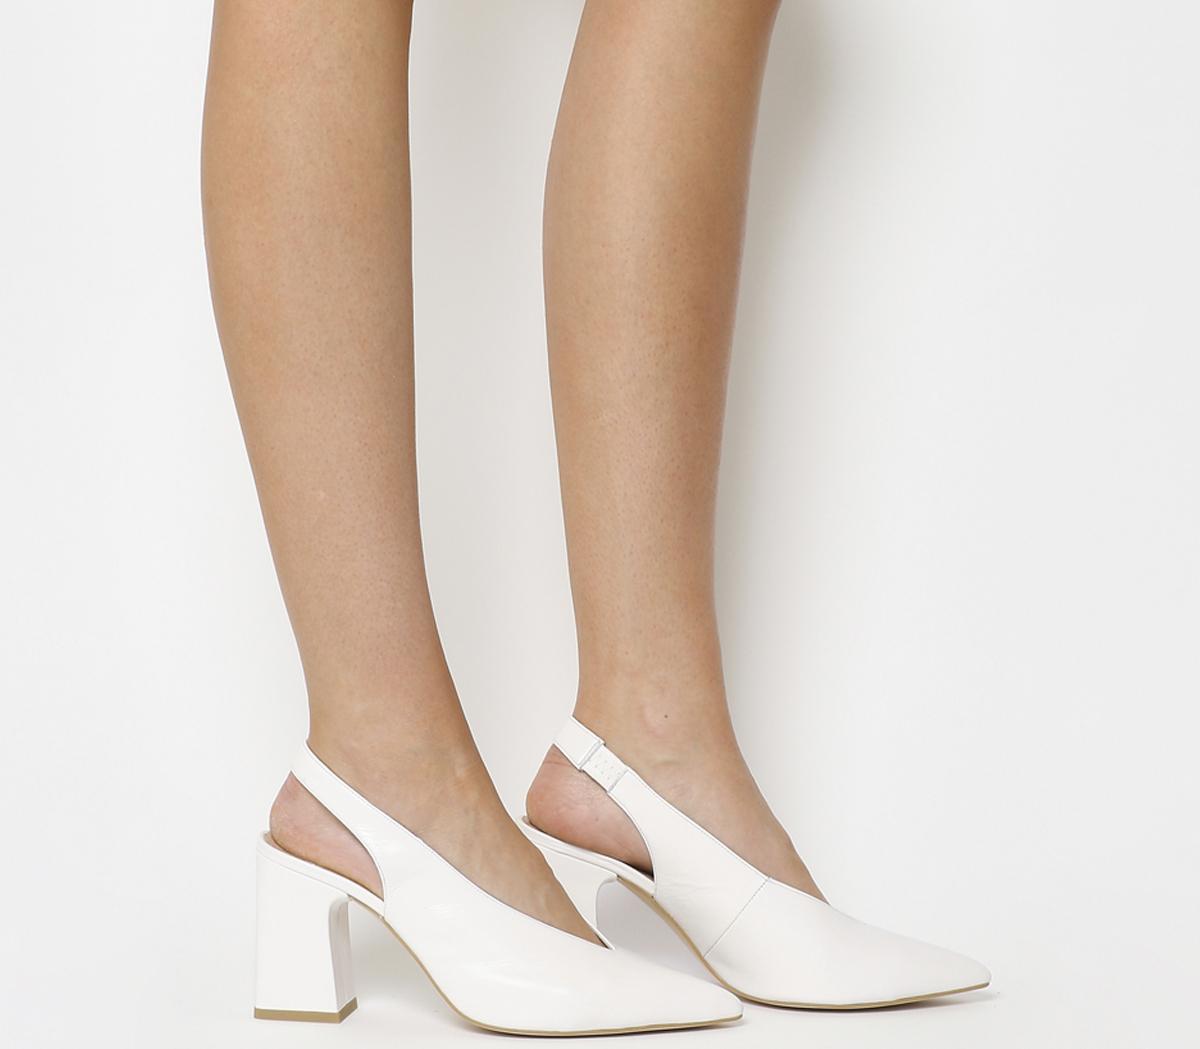 Mimi Chunky Slingback Heels